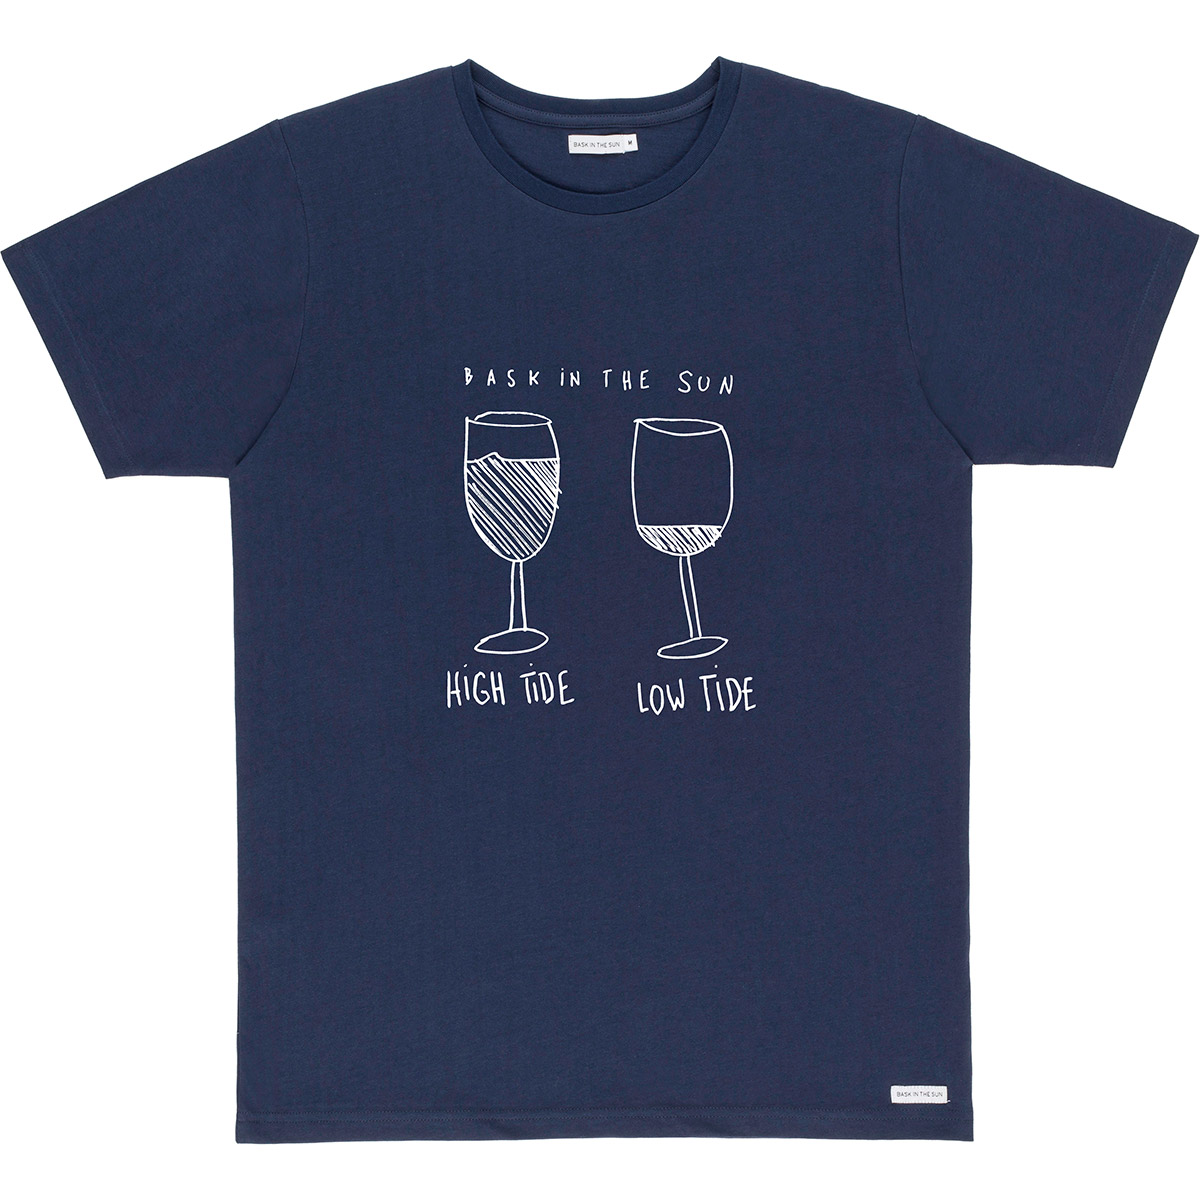 T-shirt en coton bio navy marees - Bask in the Sun num 0